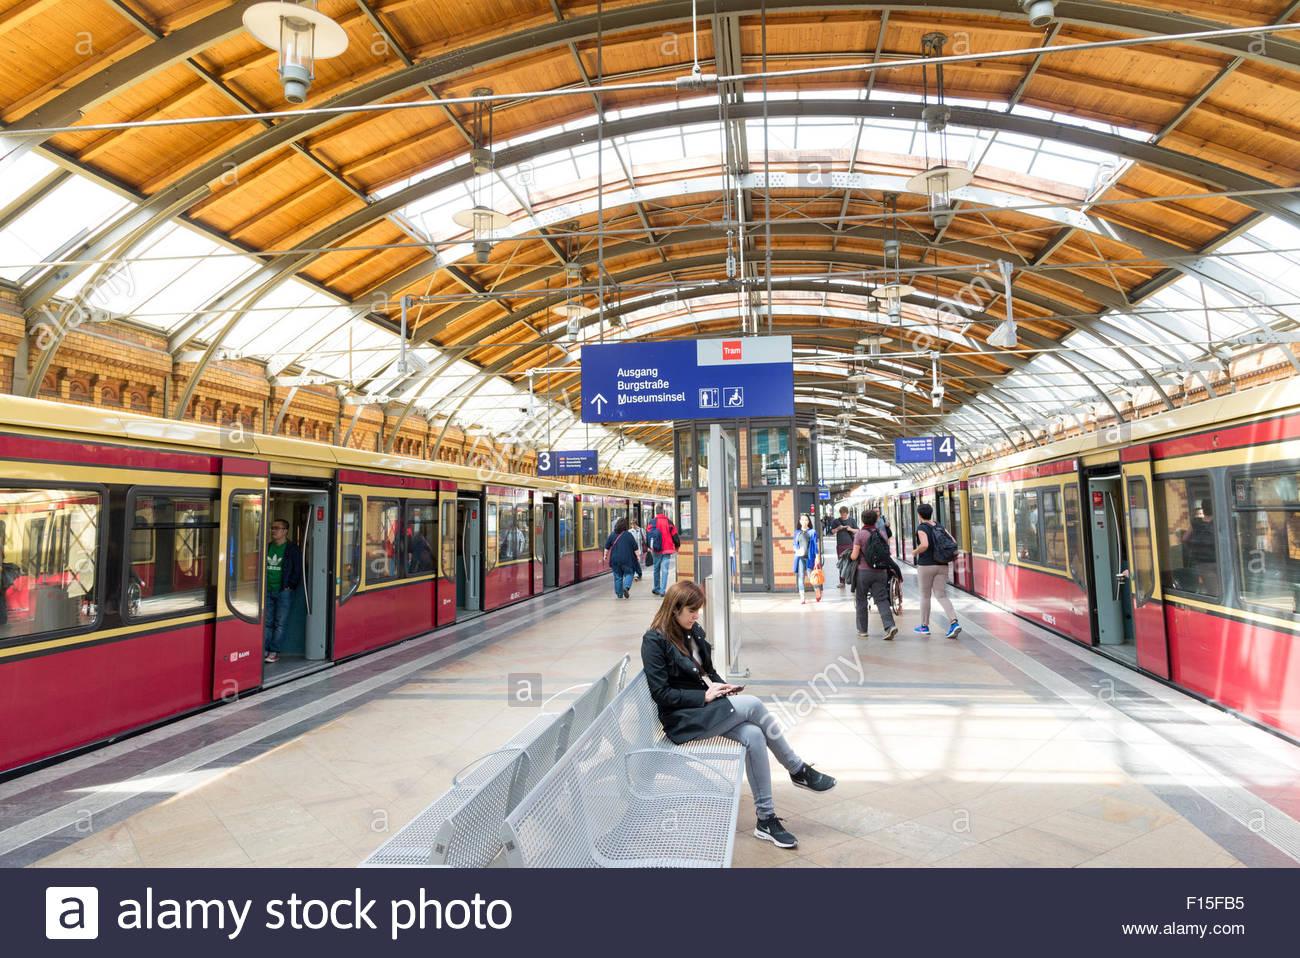 Hackescher Markt S-Bahn Station, Berlin, Deutschland Stockbild